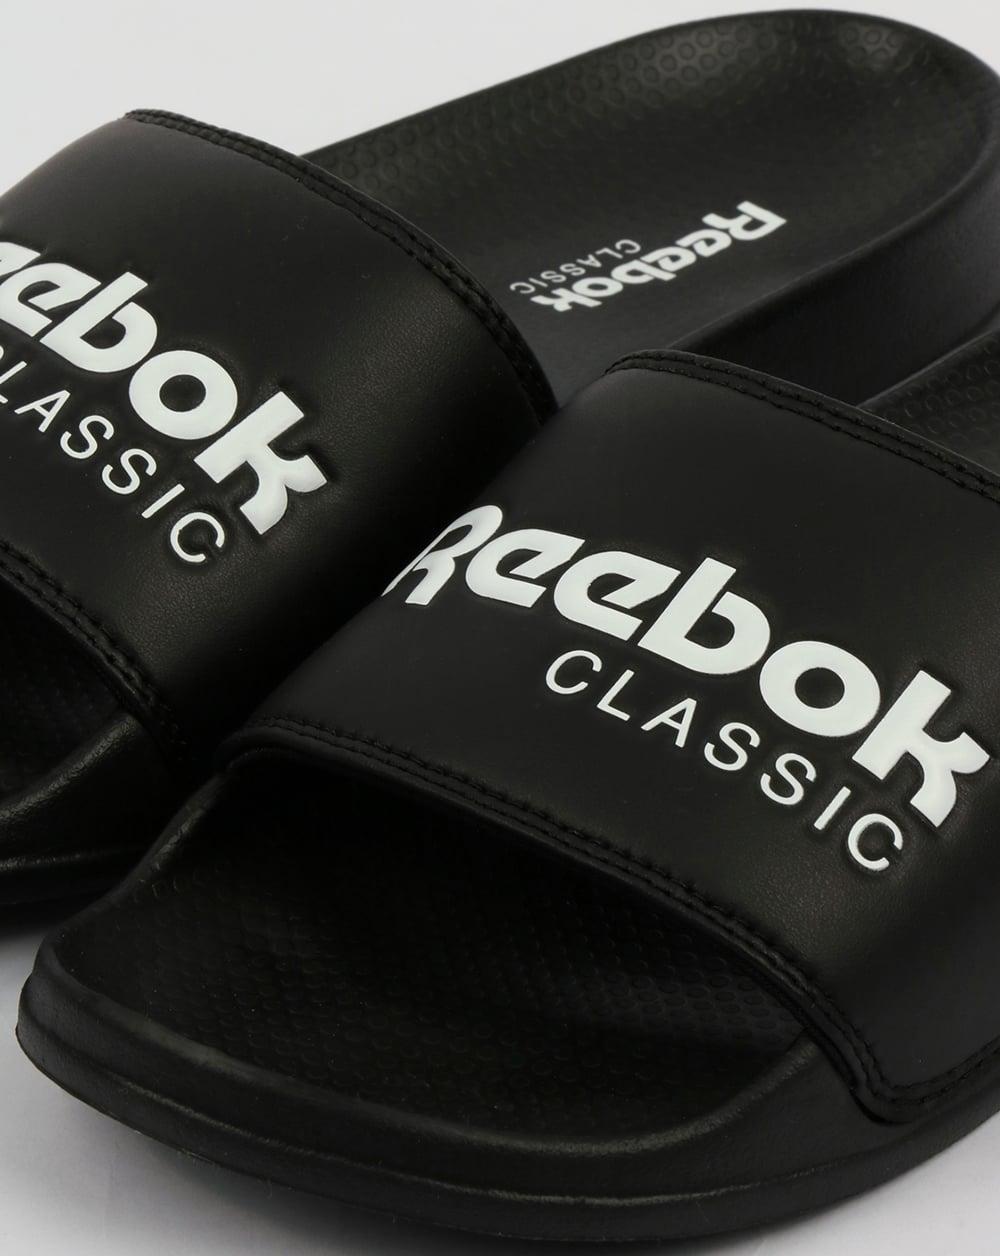 b076d0fea64cc1 Reebok Classic Sliders Black